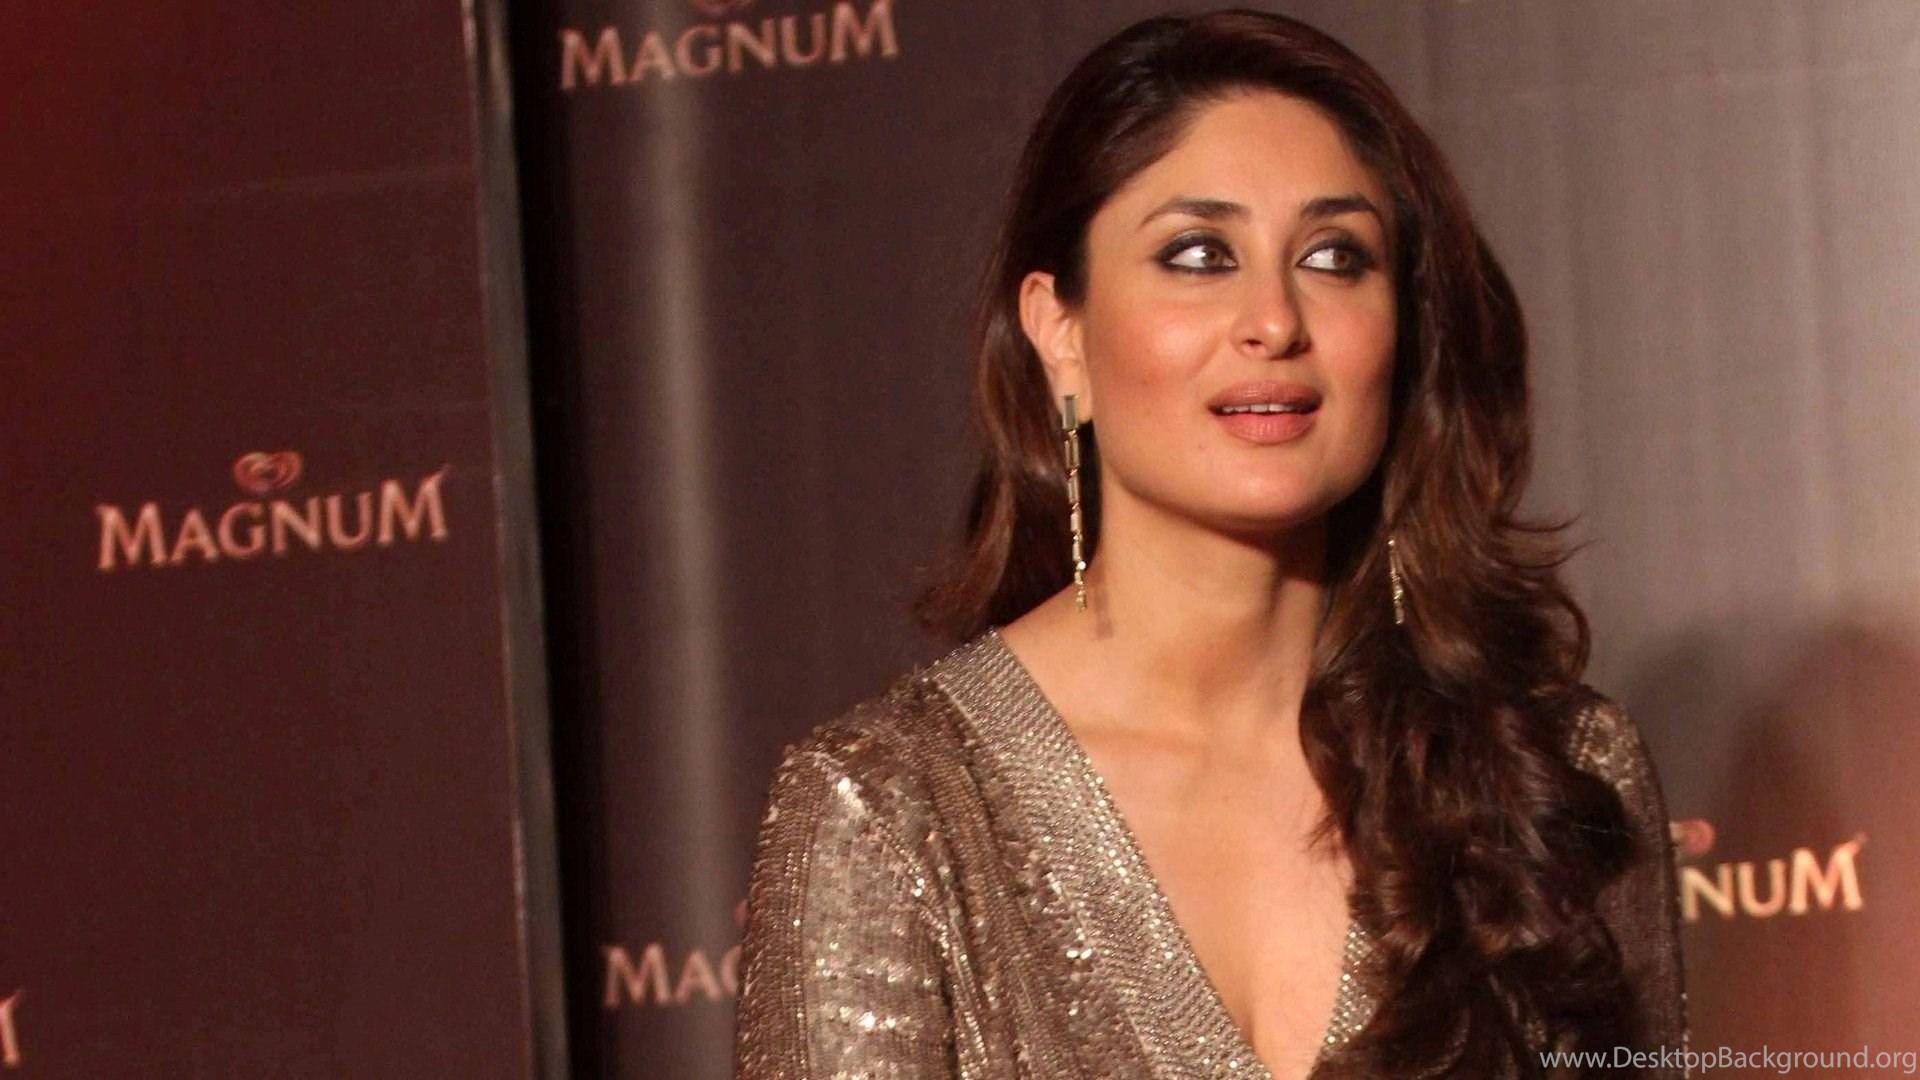 Hot And Sexy Bollywood Actress Kareena Kapoor Hd Wallpapers Desktop